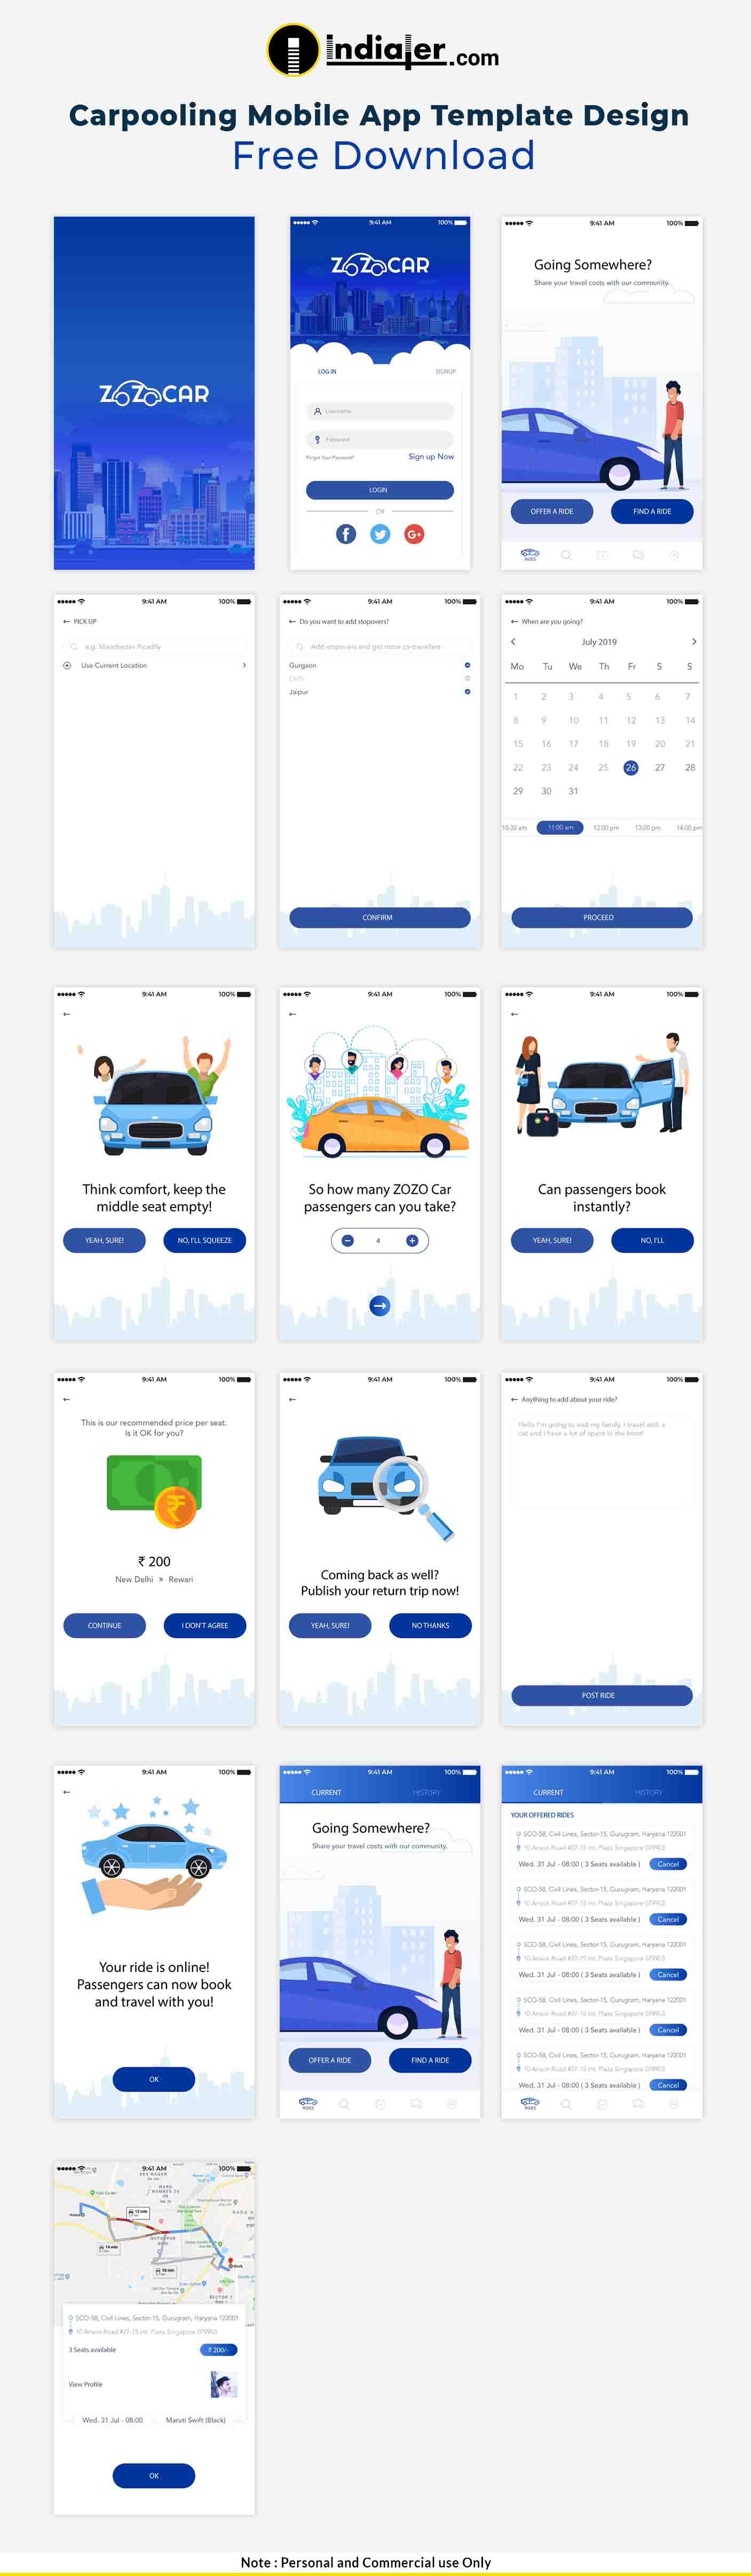 carpooling-mobile-app-template-design-free-download